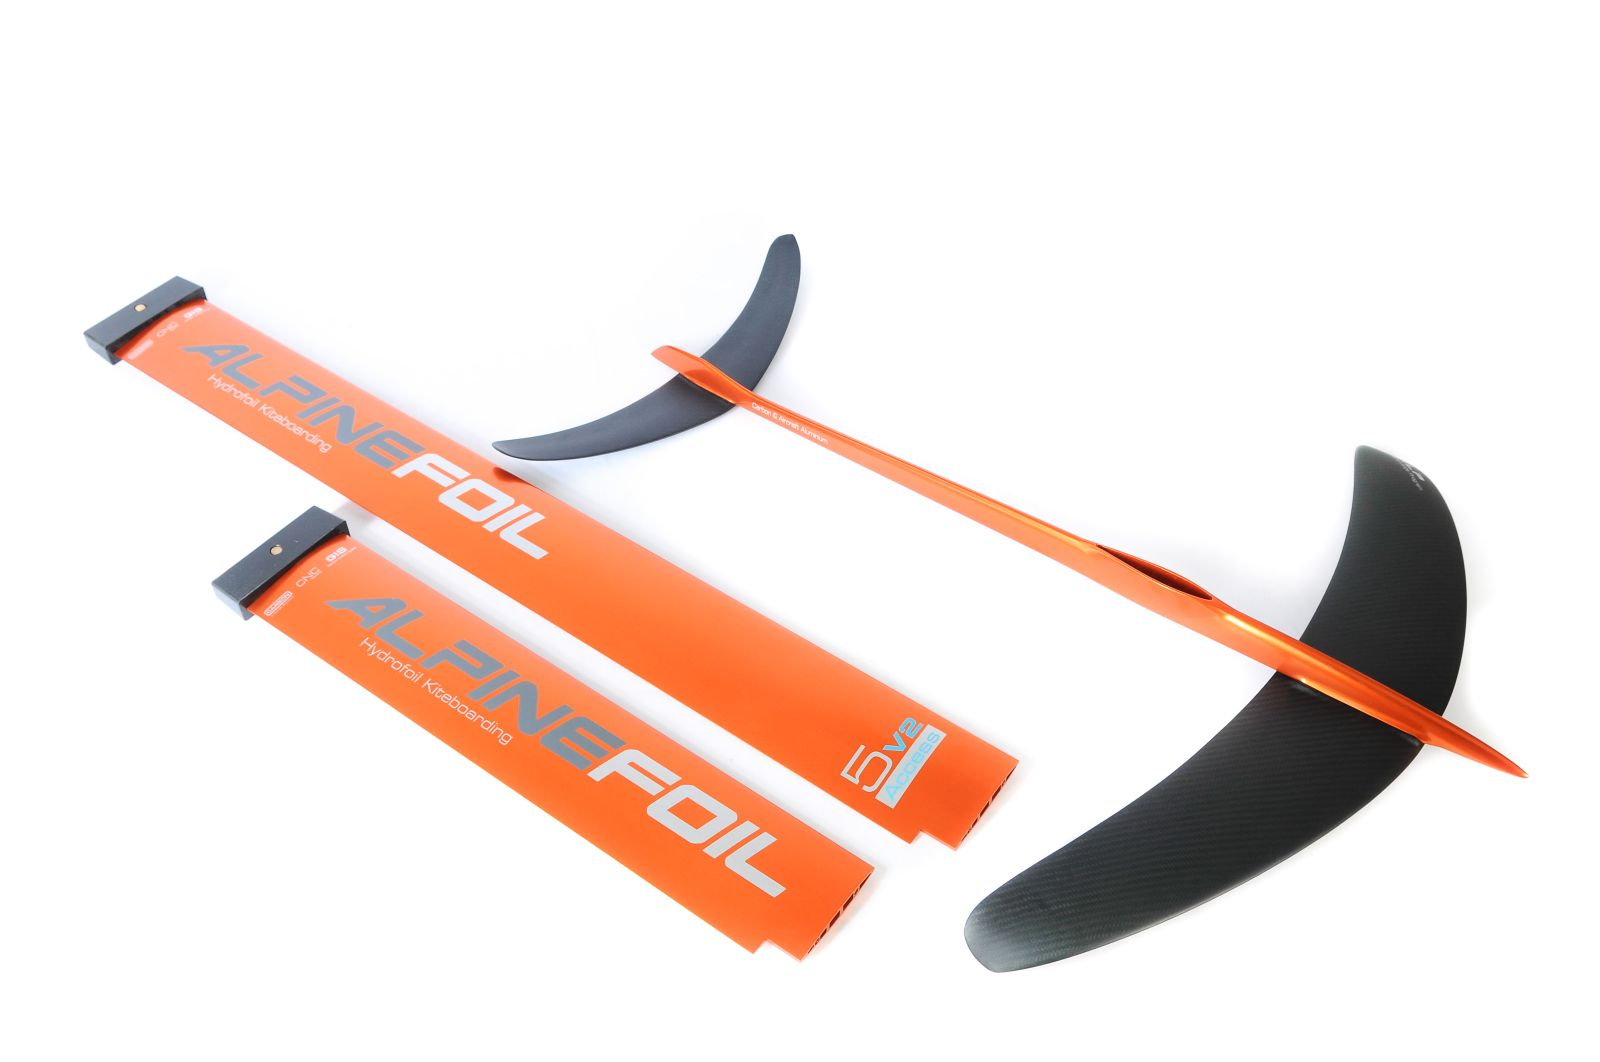 Kitefoil carbon aluminium alpinefoil 5 0 access v2 2784 1